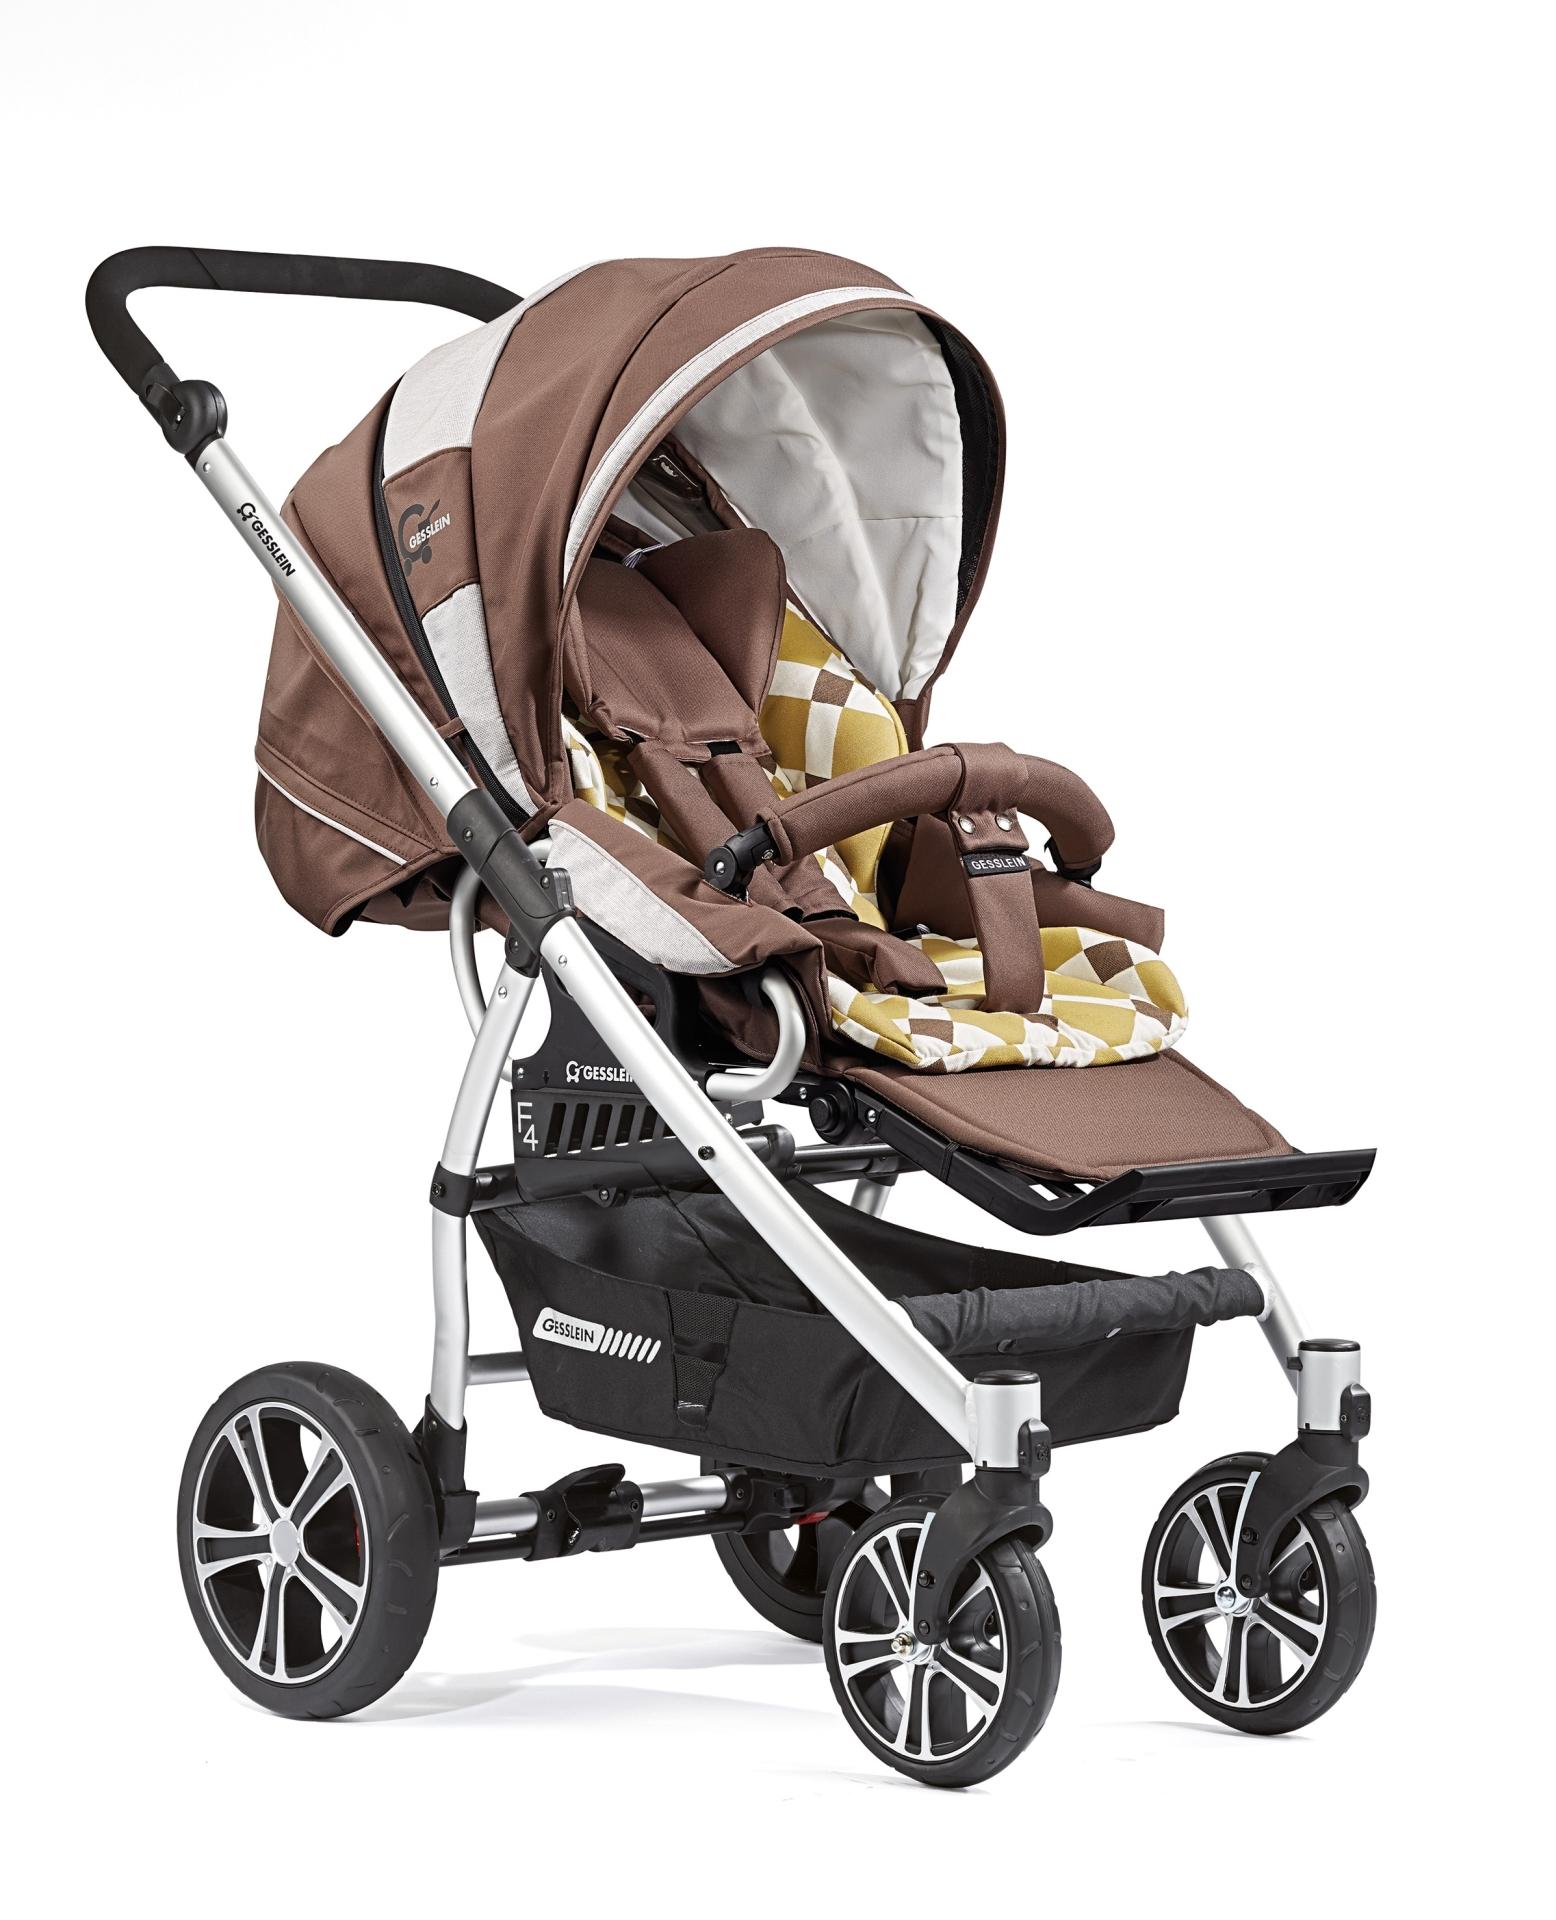 gesslein stroller f4 air 2016 654654 buy at kidsroom strollers. Black Bedroom Furniture Sets. Home Design Ideas